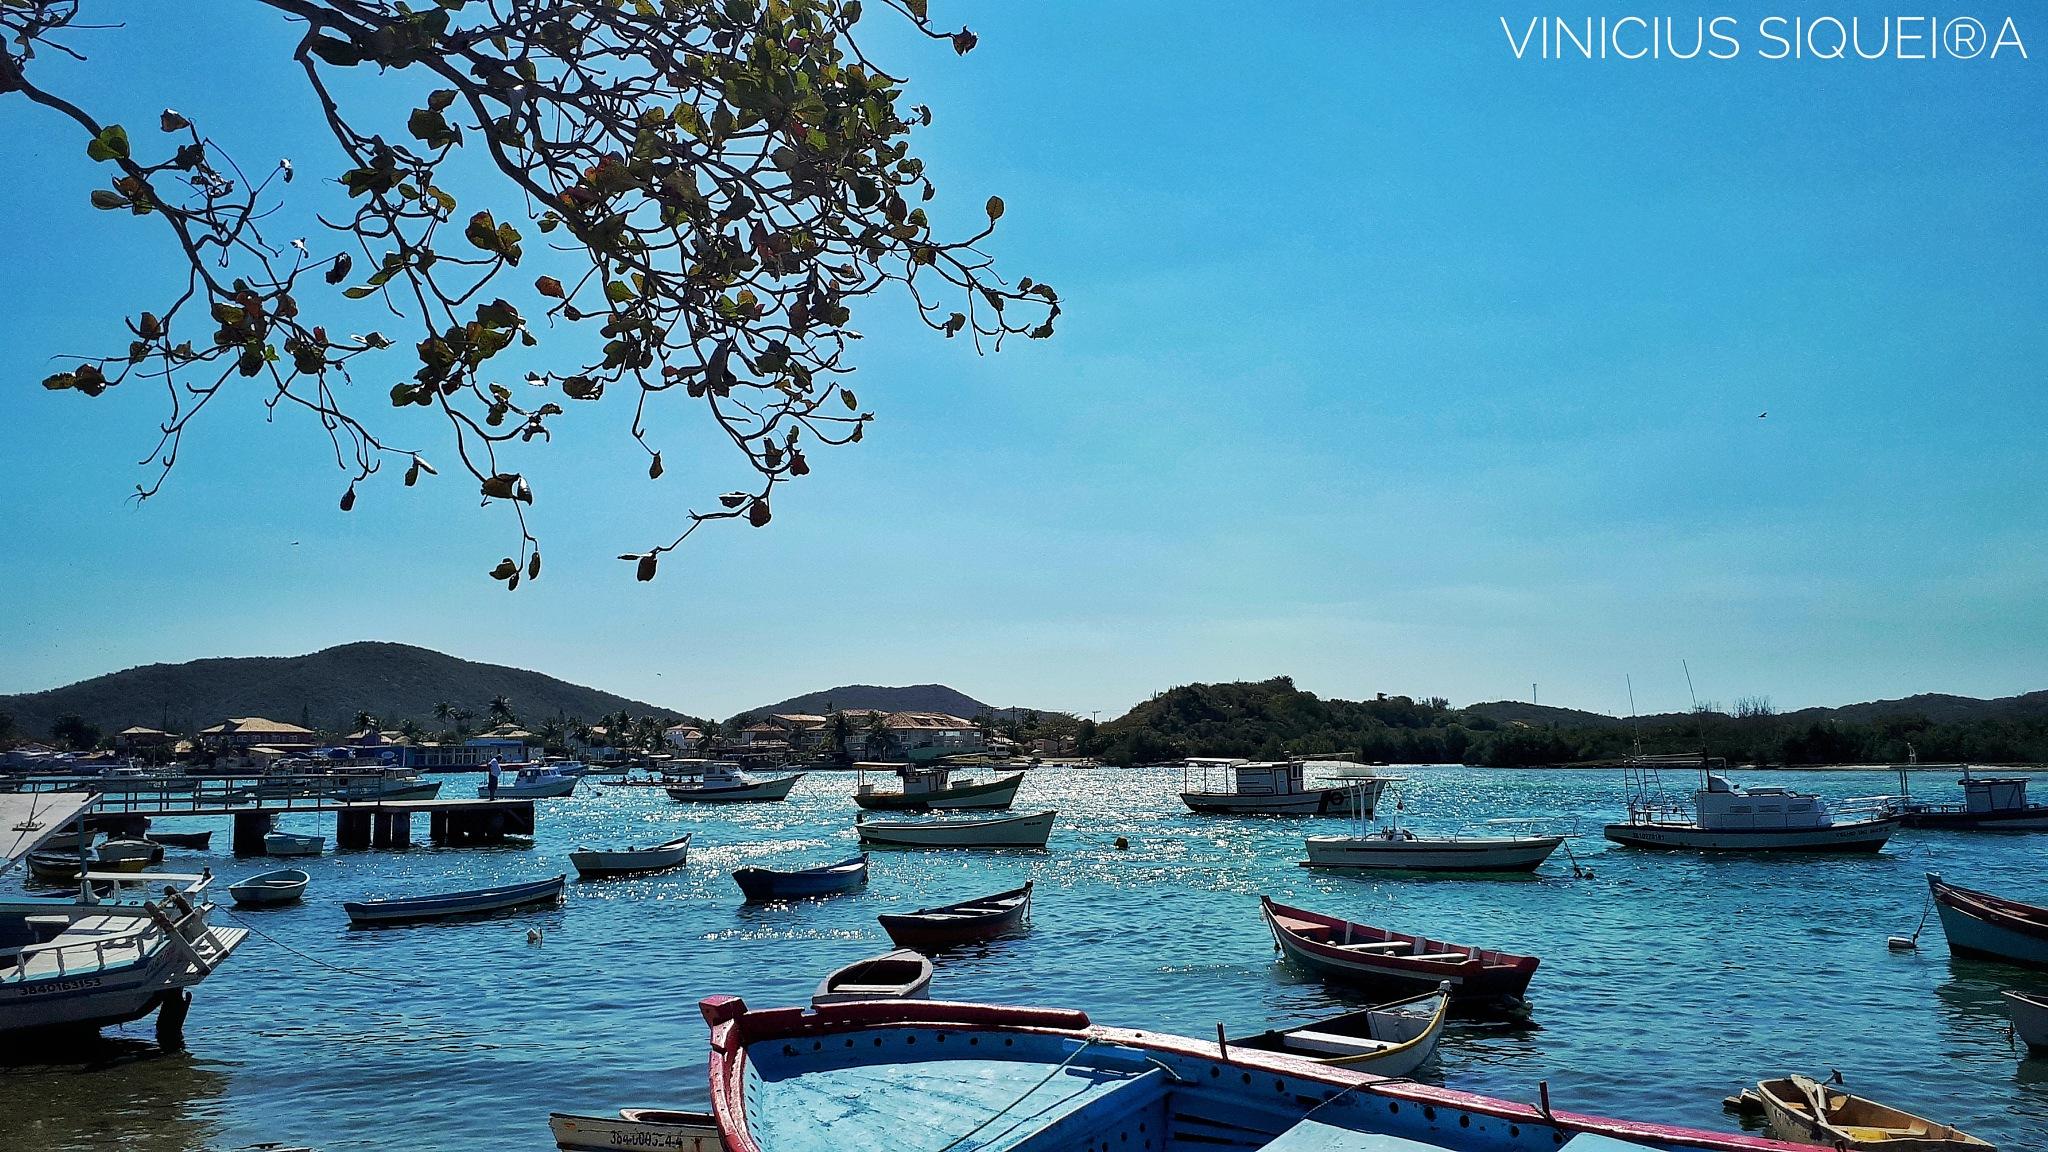 Boats  by Vinicius Siqueira